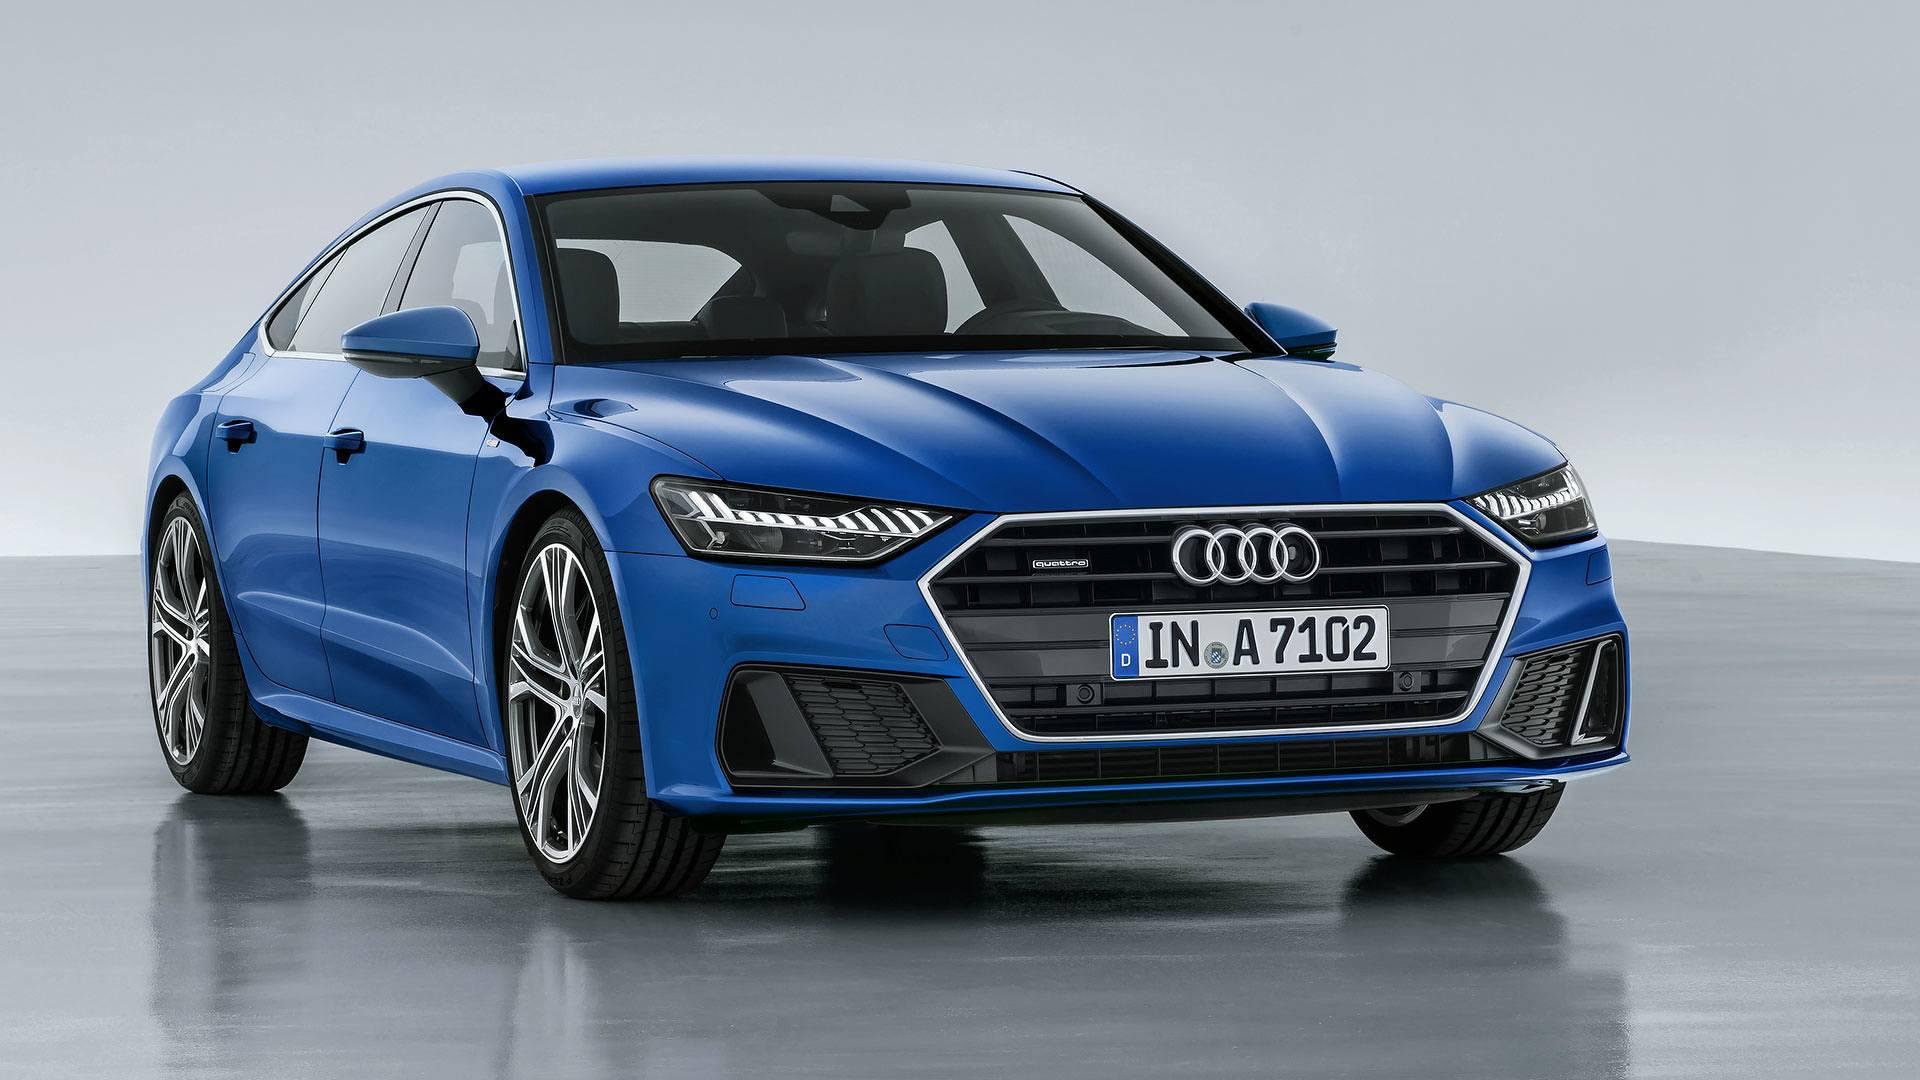 Reprogrammation Audi A7 45 2.0 TFSI 245